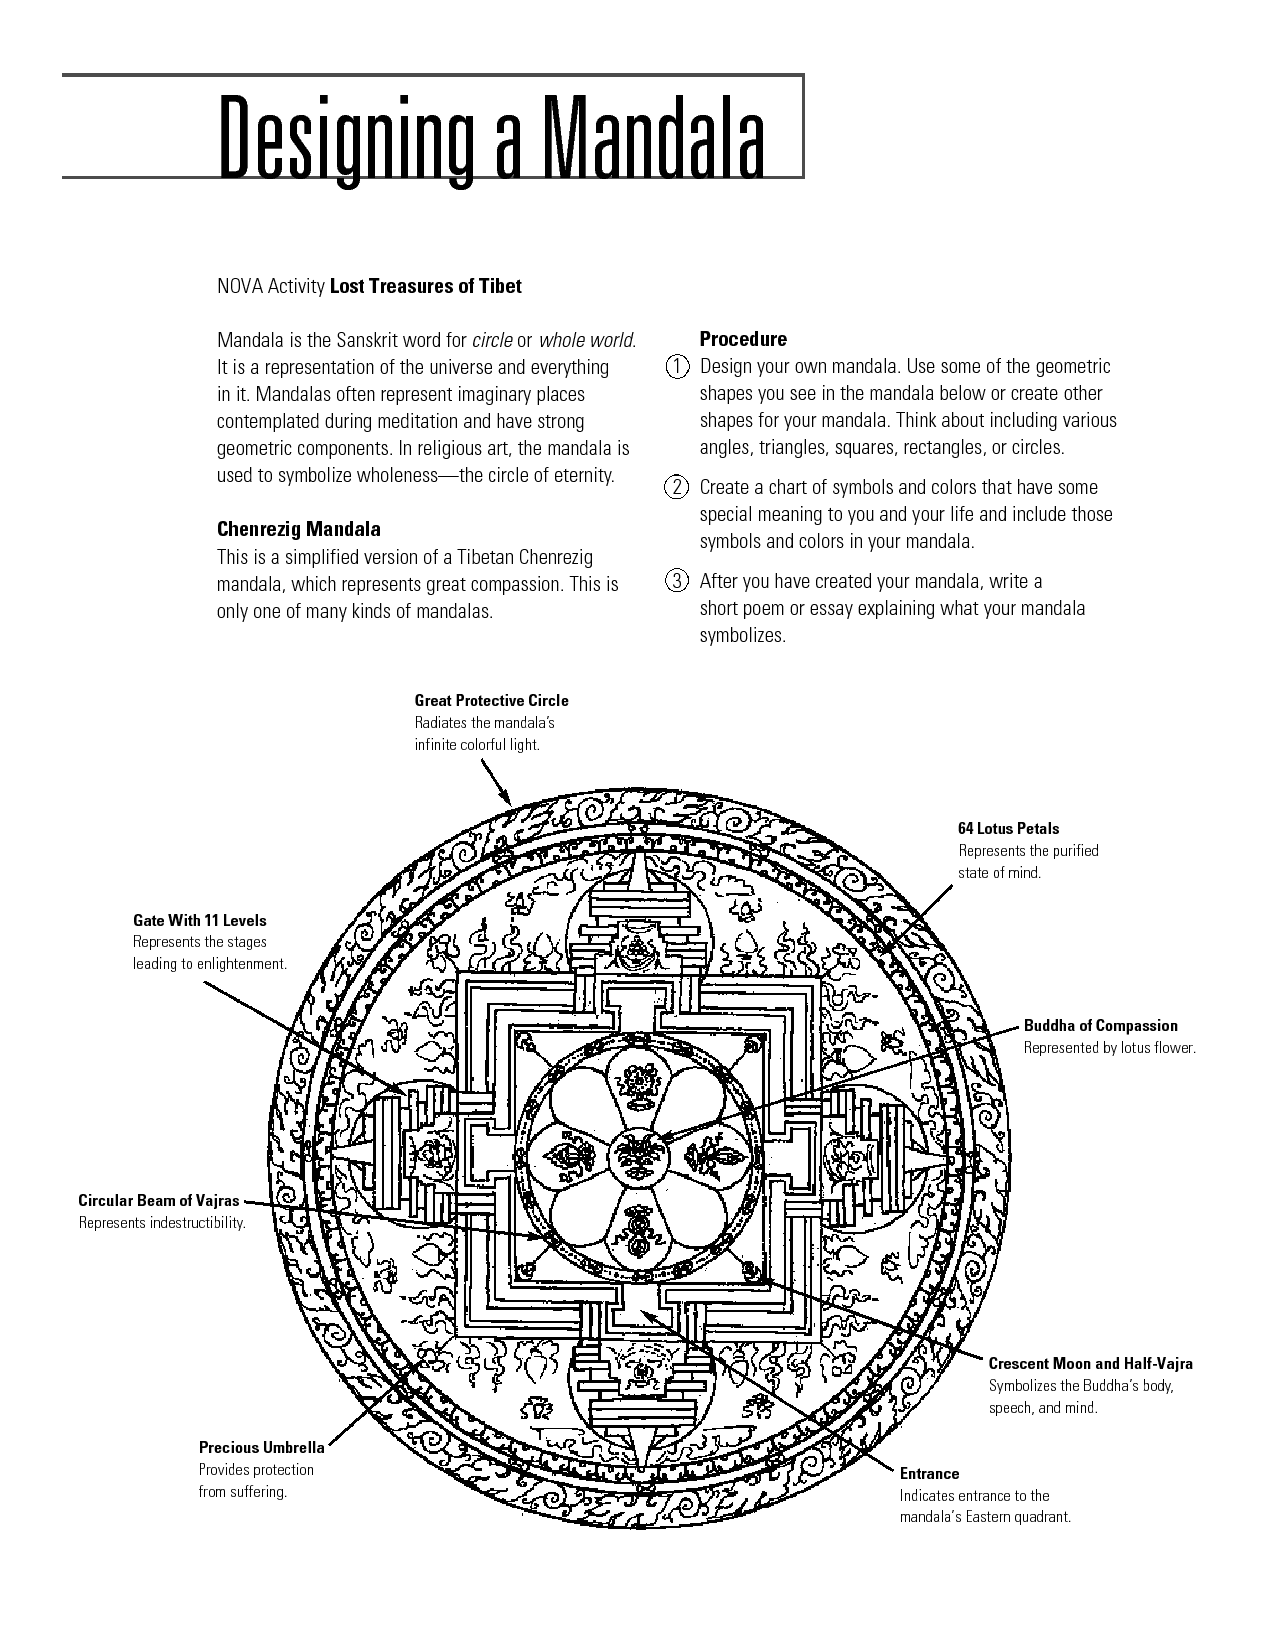 tibetan mandala designs designing mandala inspiration mandala design mandala tibetan. Black Bedroom Furniture Sets. Home Design Ideas